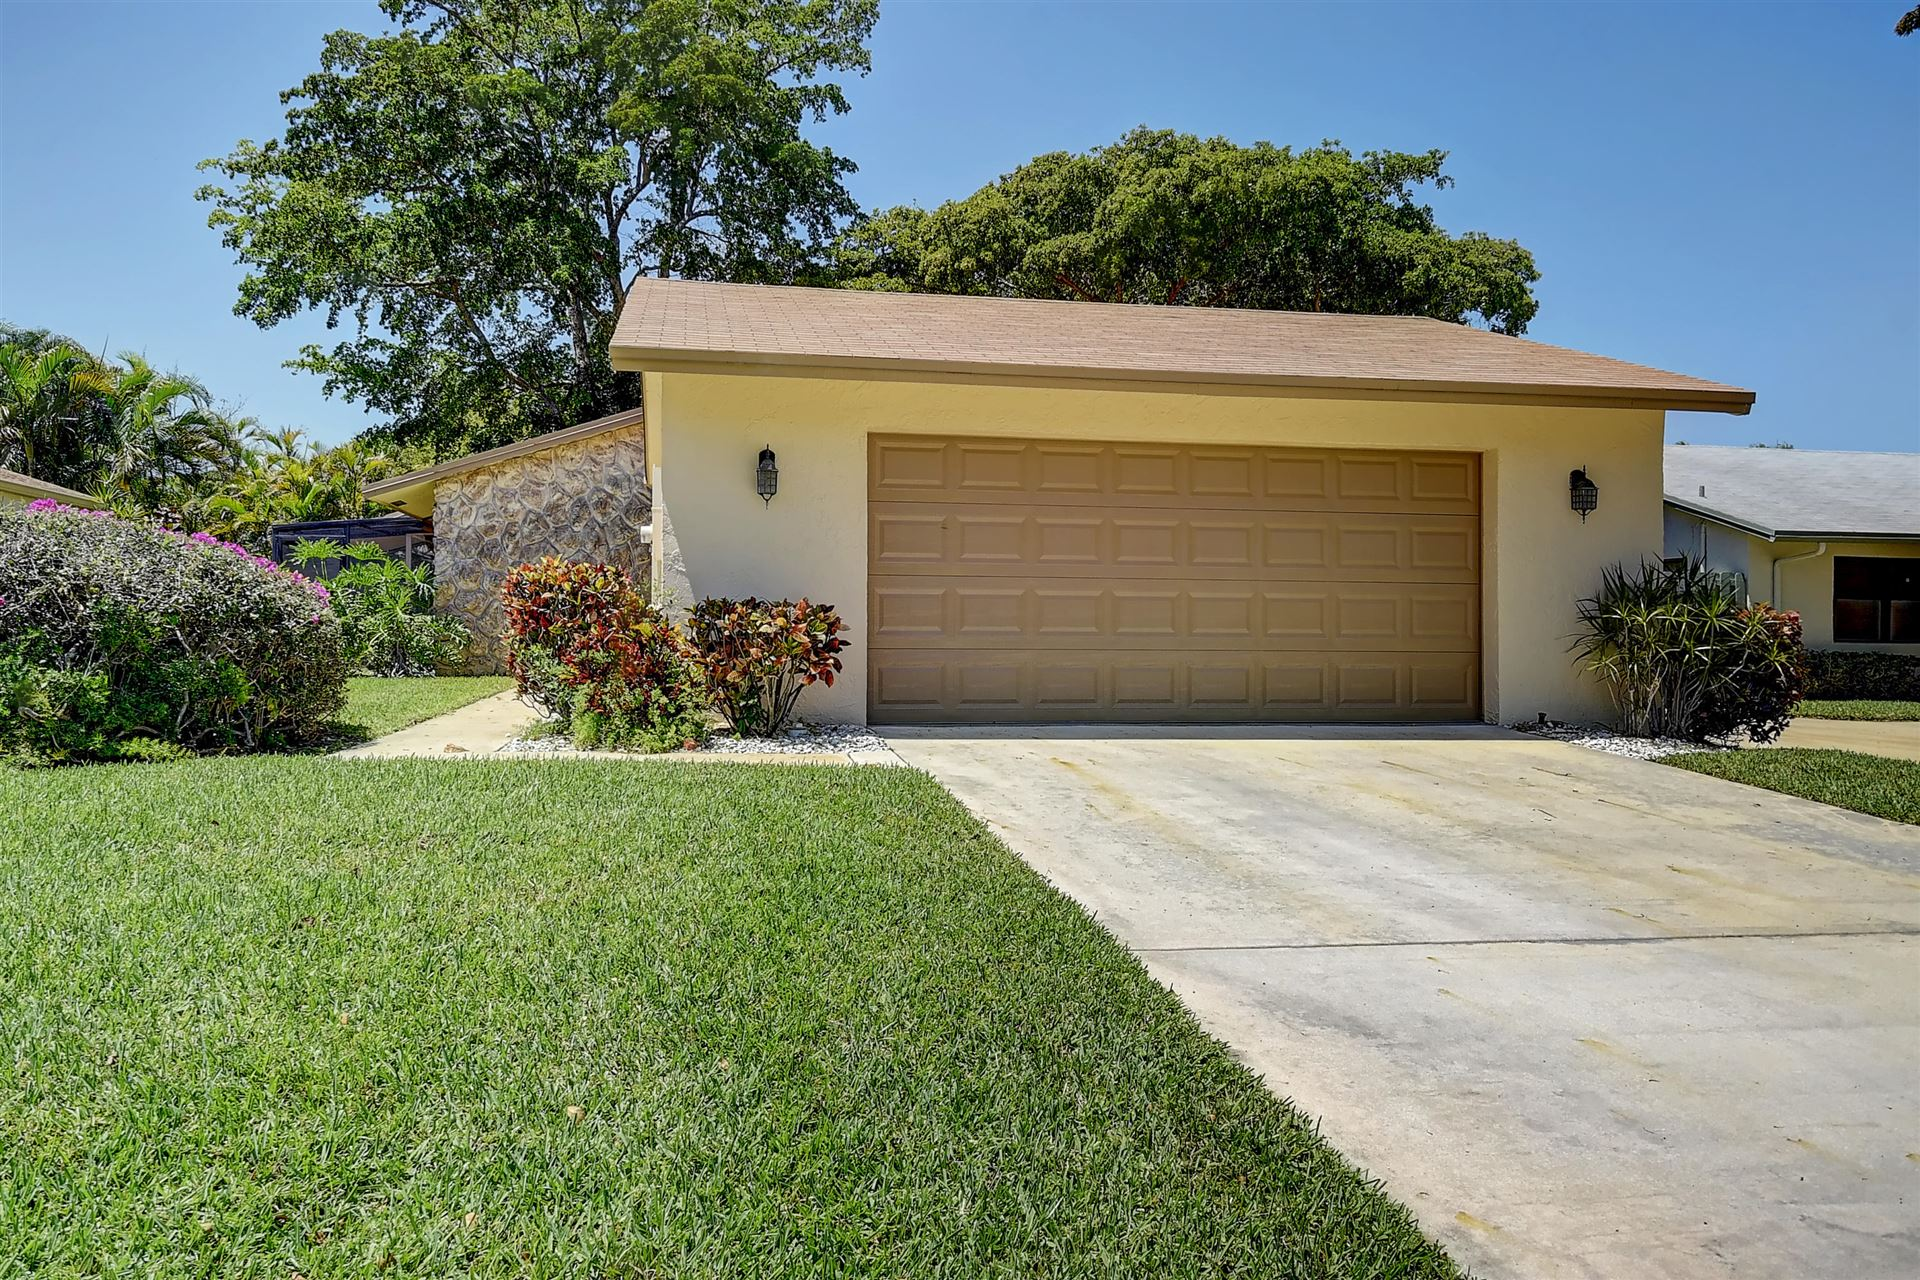 796 NW 25th Avenue, Delray Beach, FL 33445 - #: RX-10707803